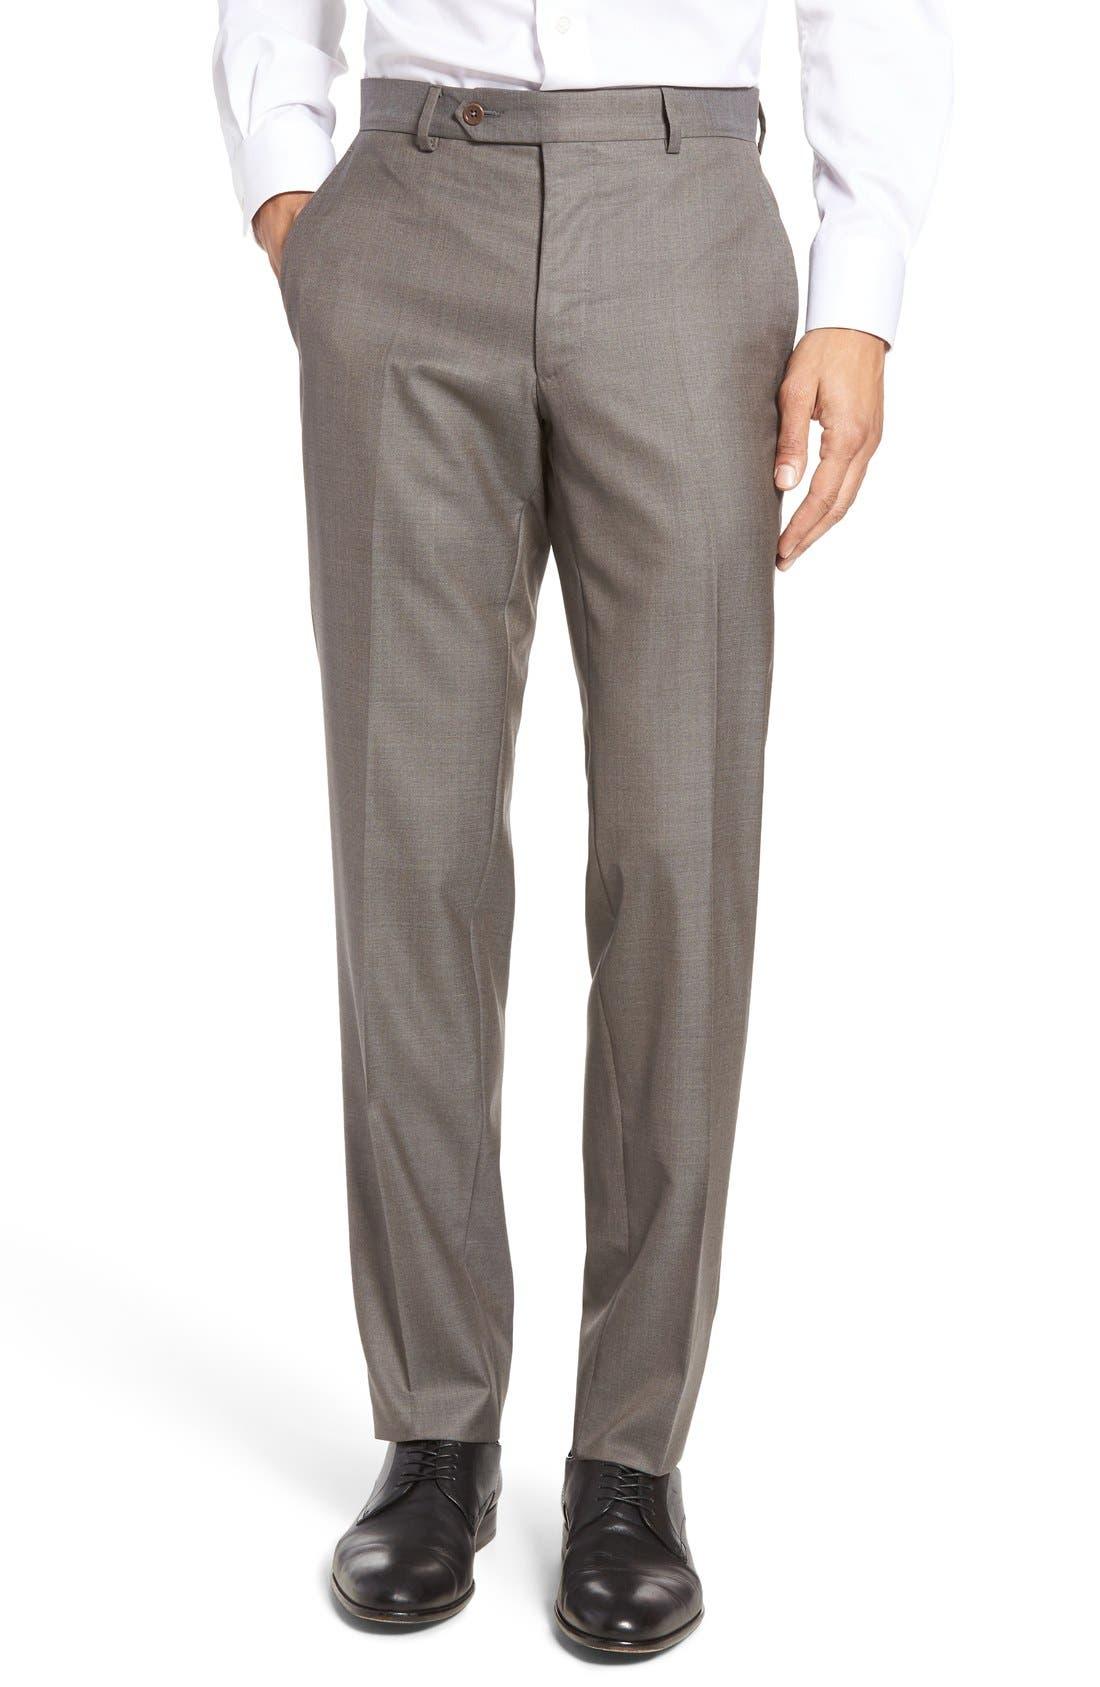 PETER MILLAR Multi Season Flat Front Merino Wool Trousers